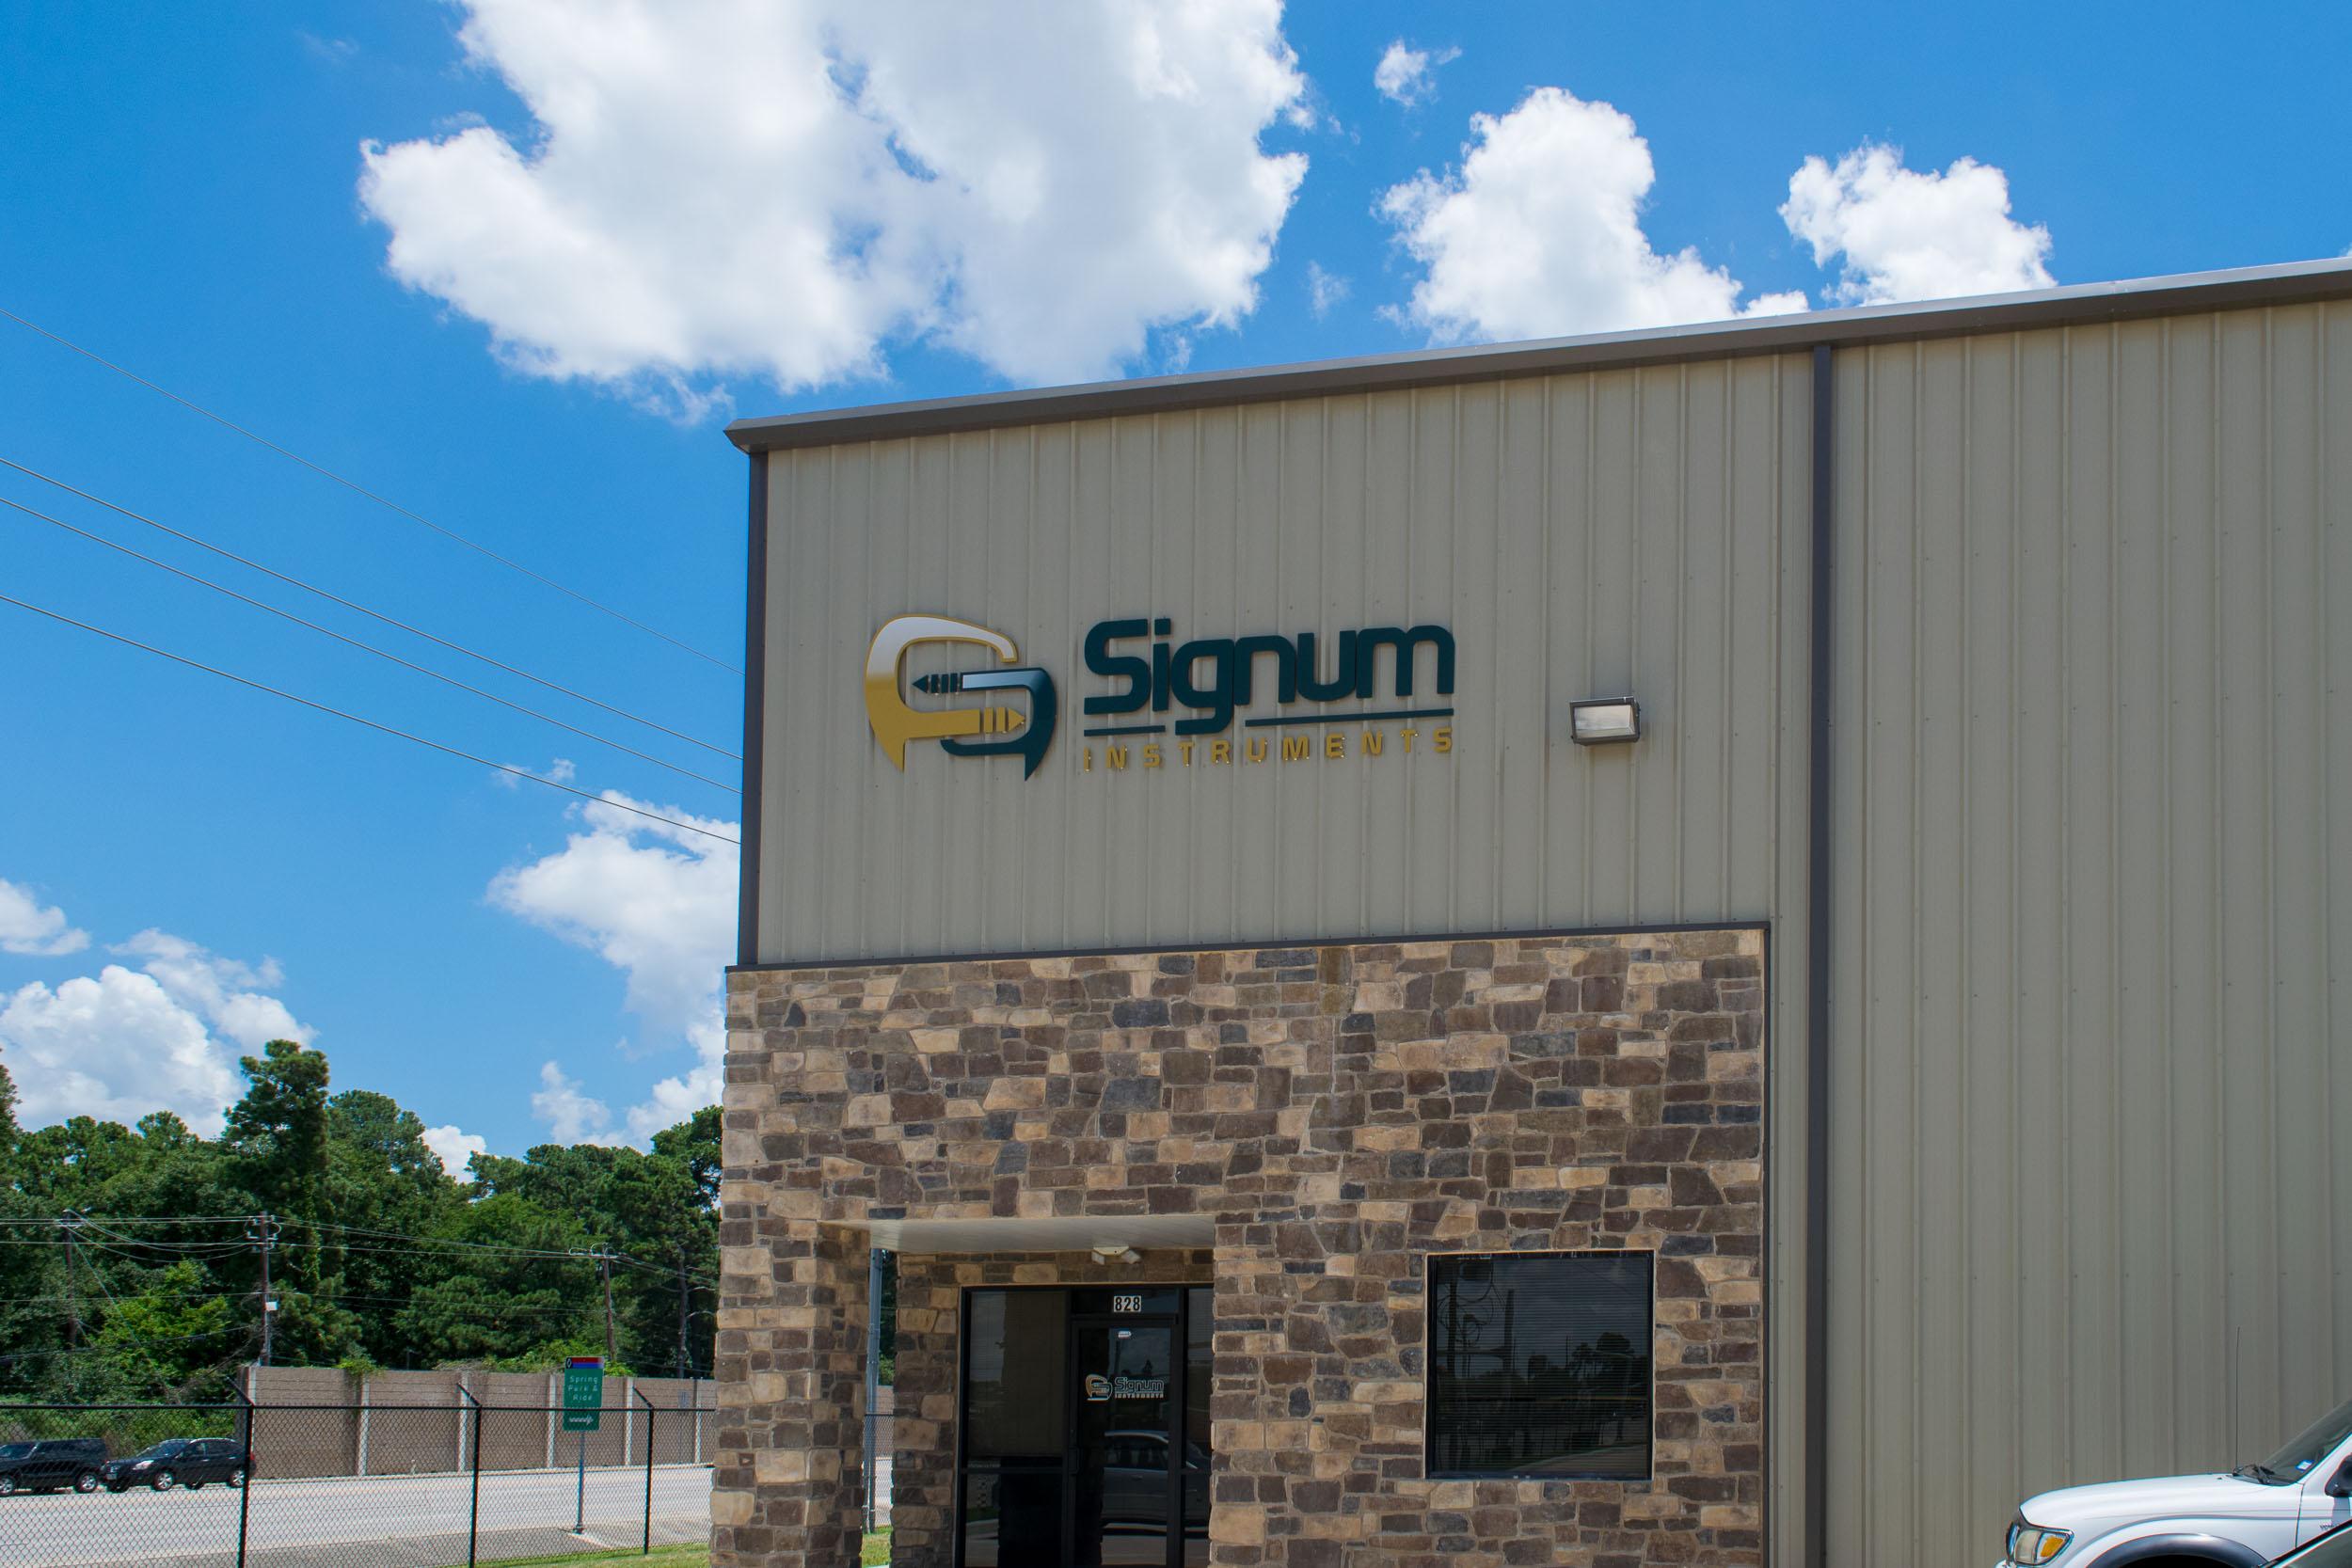 Signum_Warehouse_Sign_web.jpg